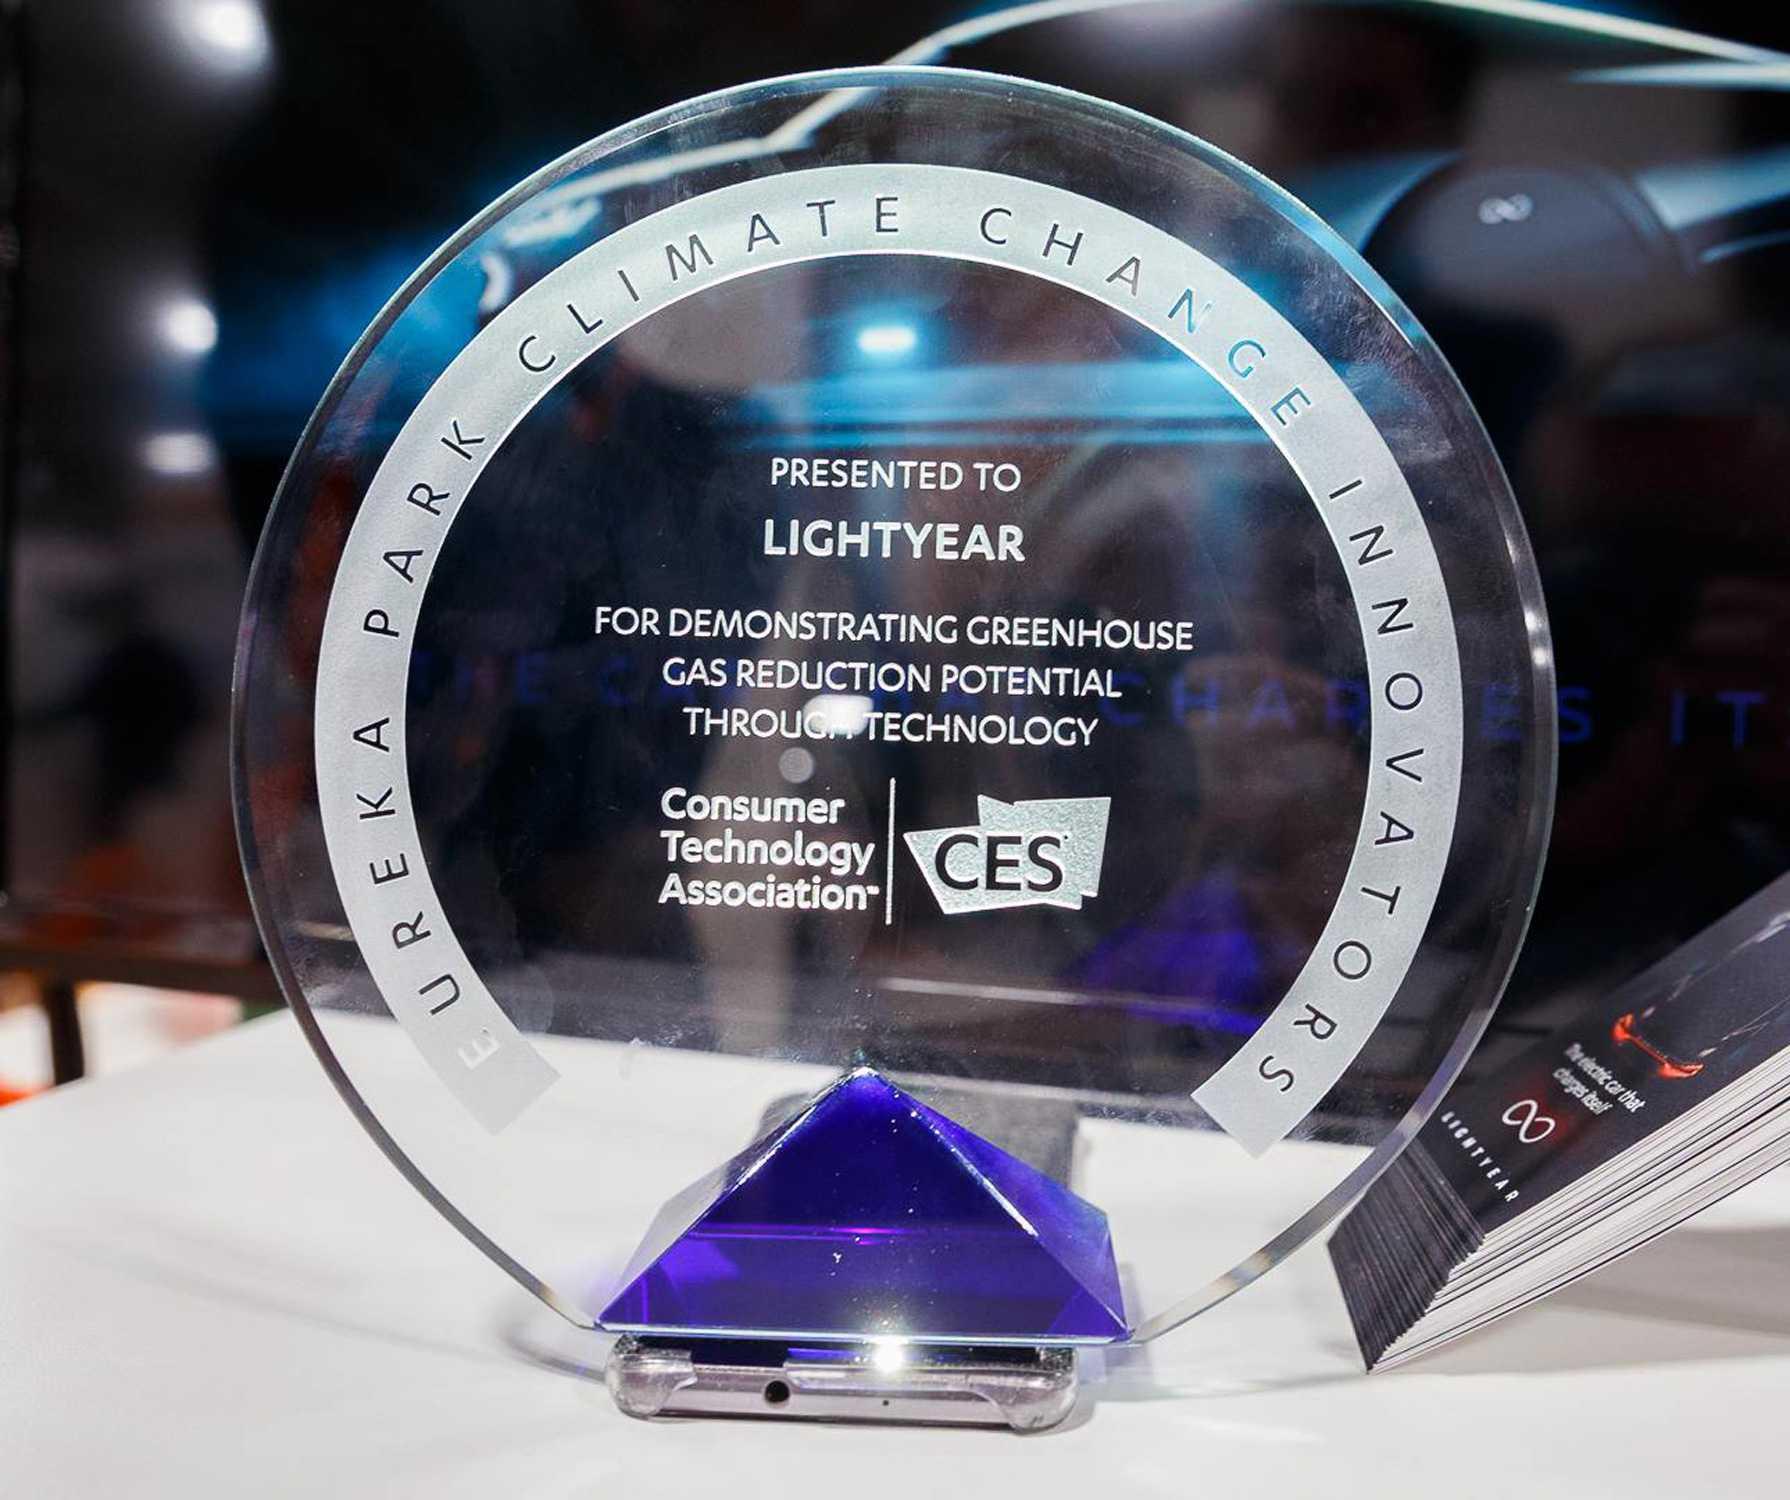 CES Climate Change Innovator Awards